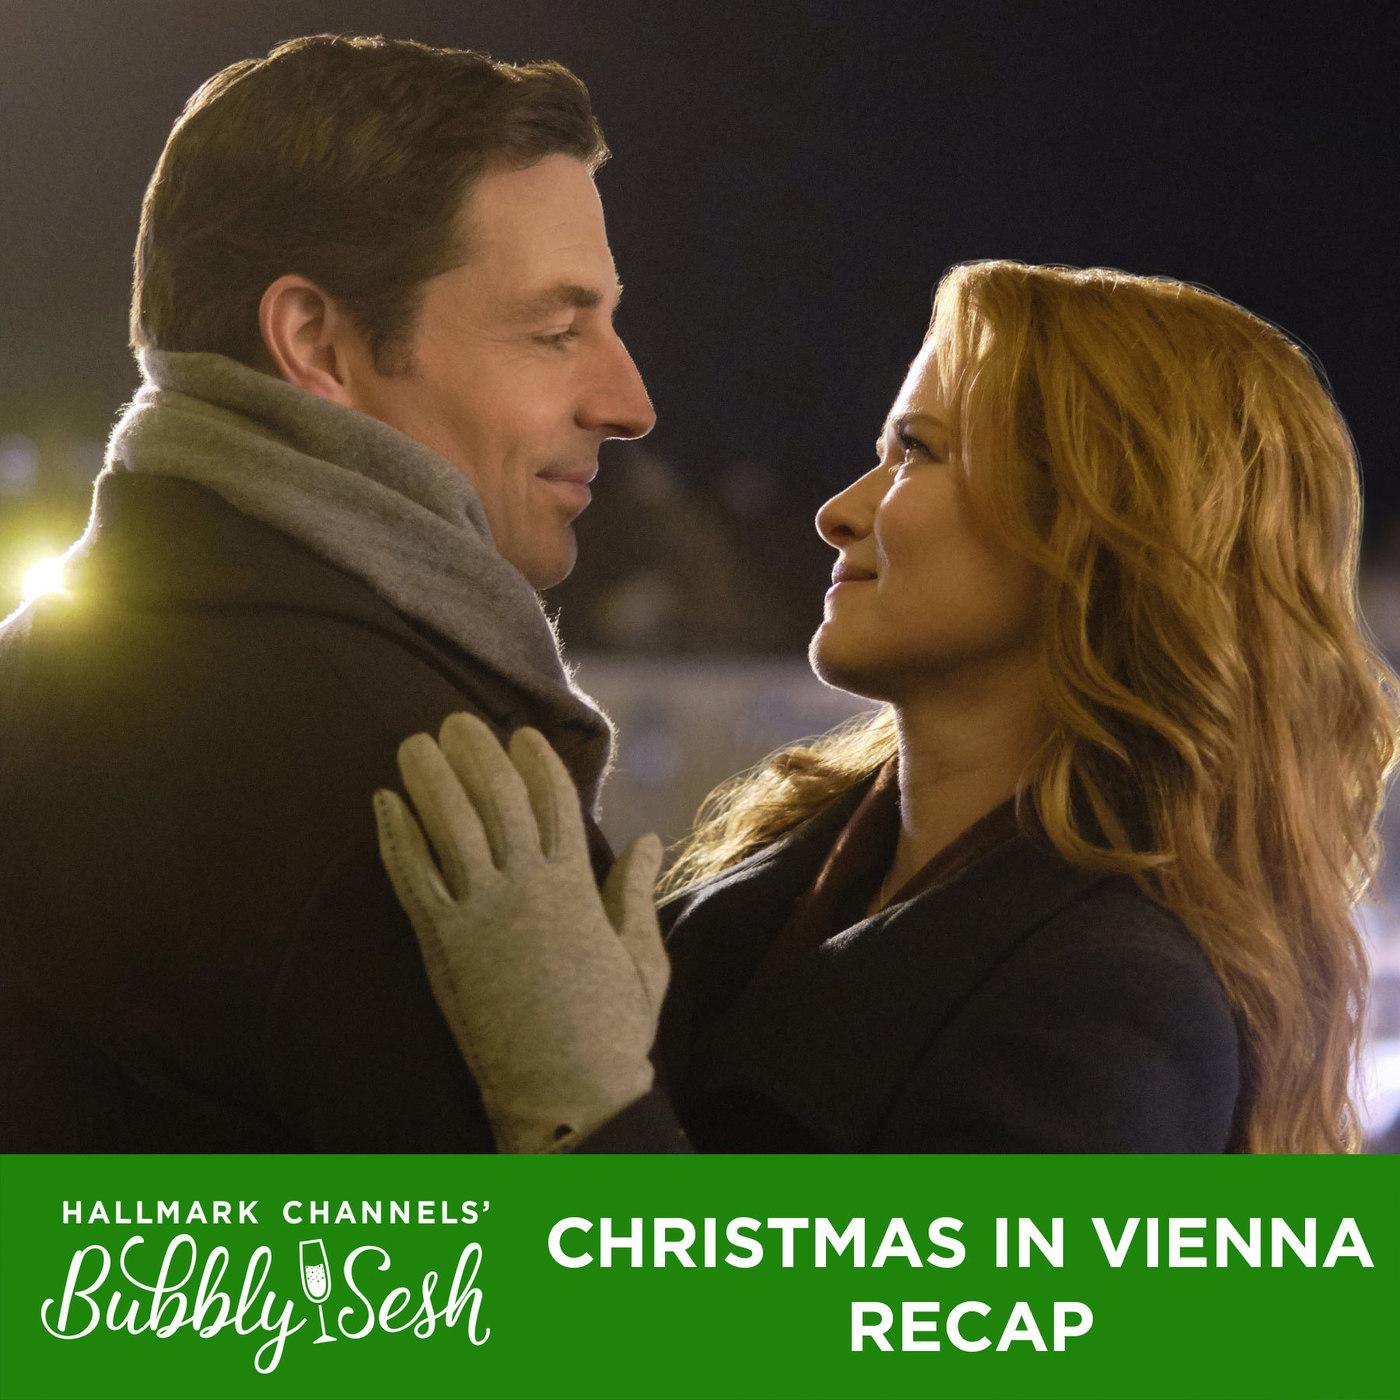 Christmas in Vienna Recap